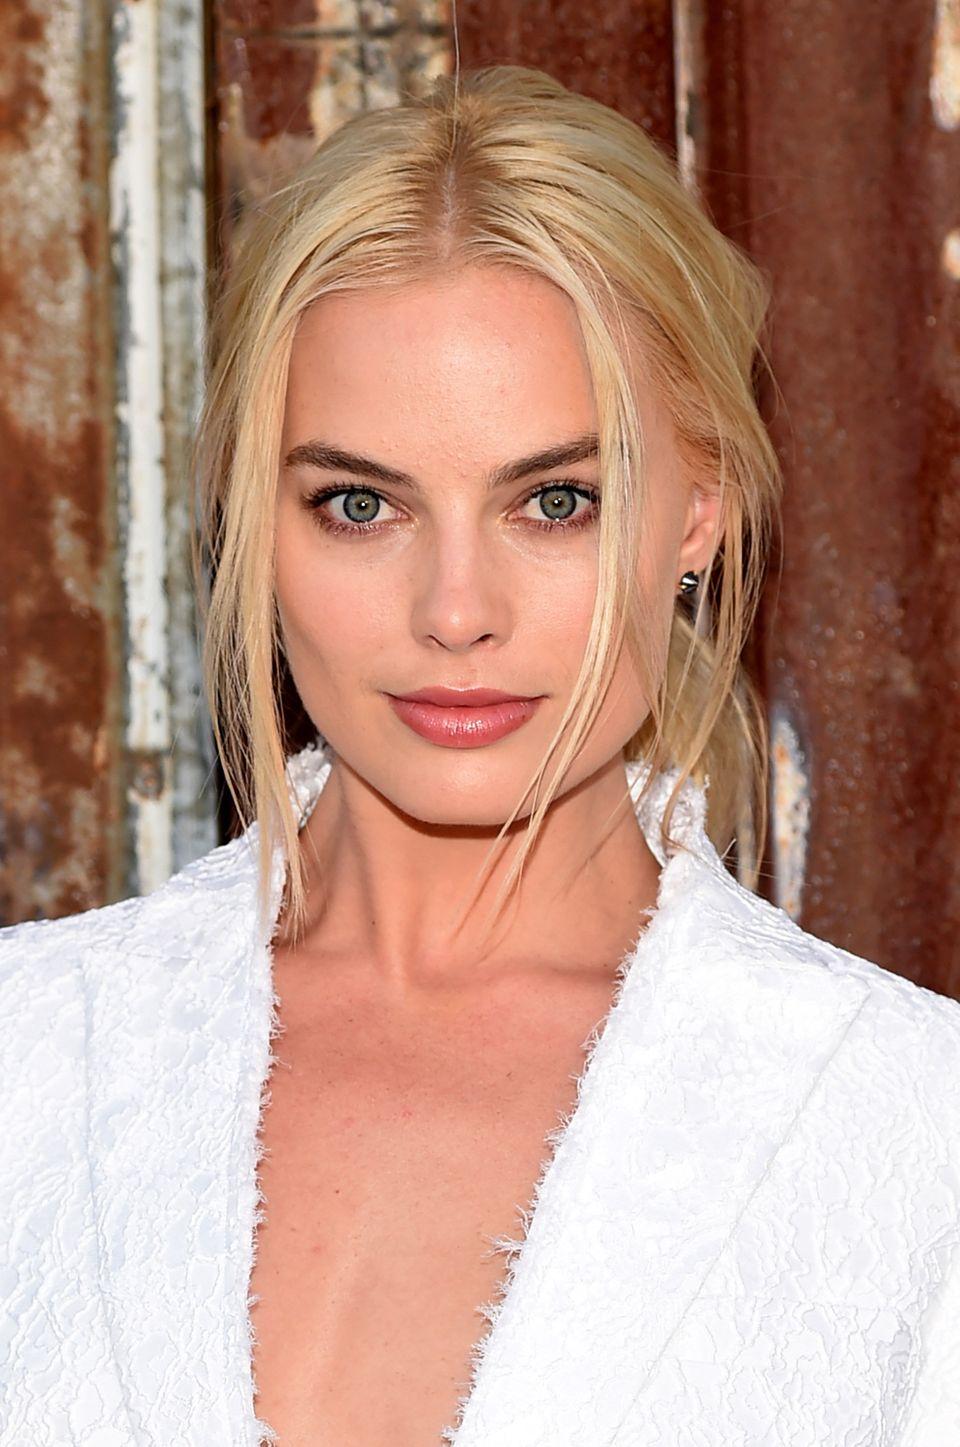 Berühmte blonde Filmstars Mädchen auf